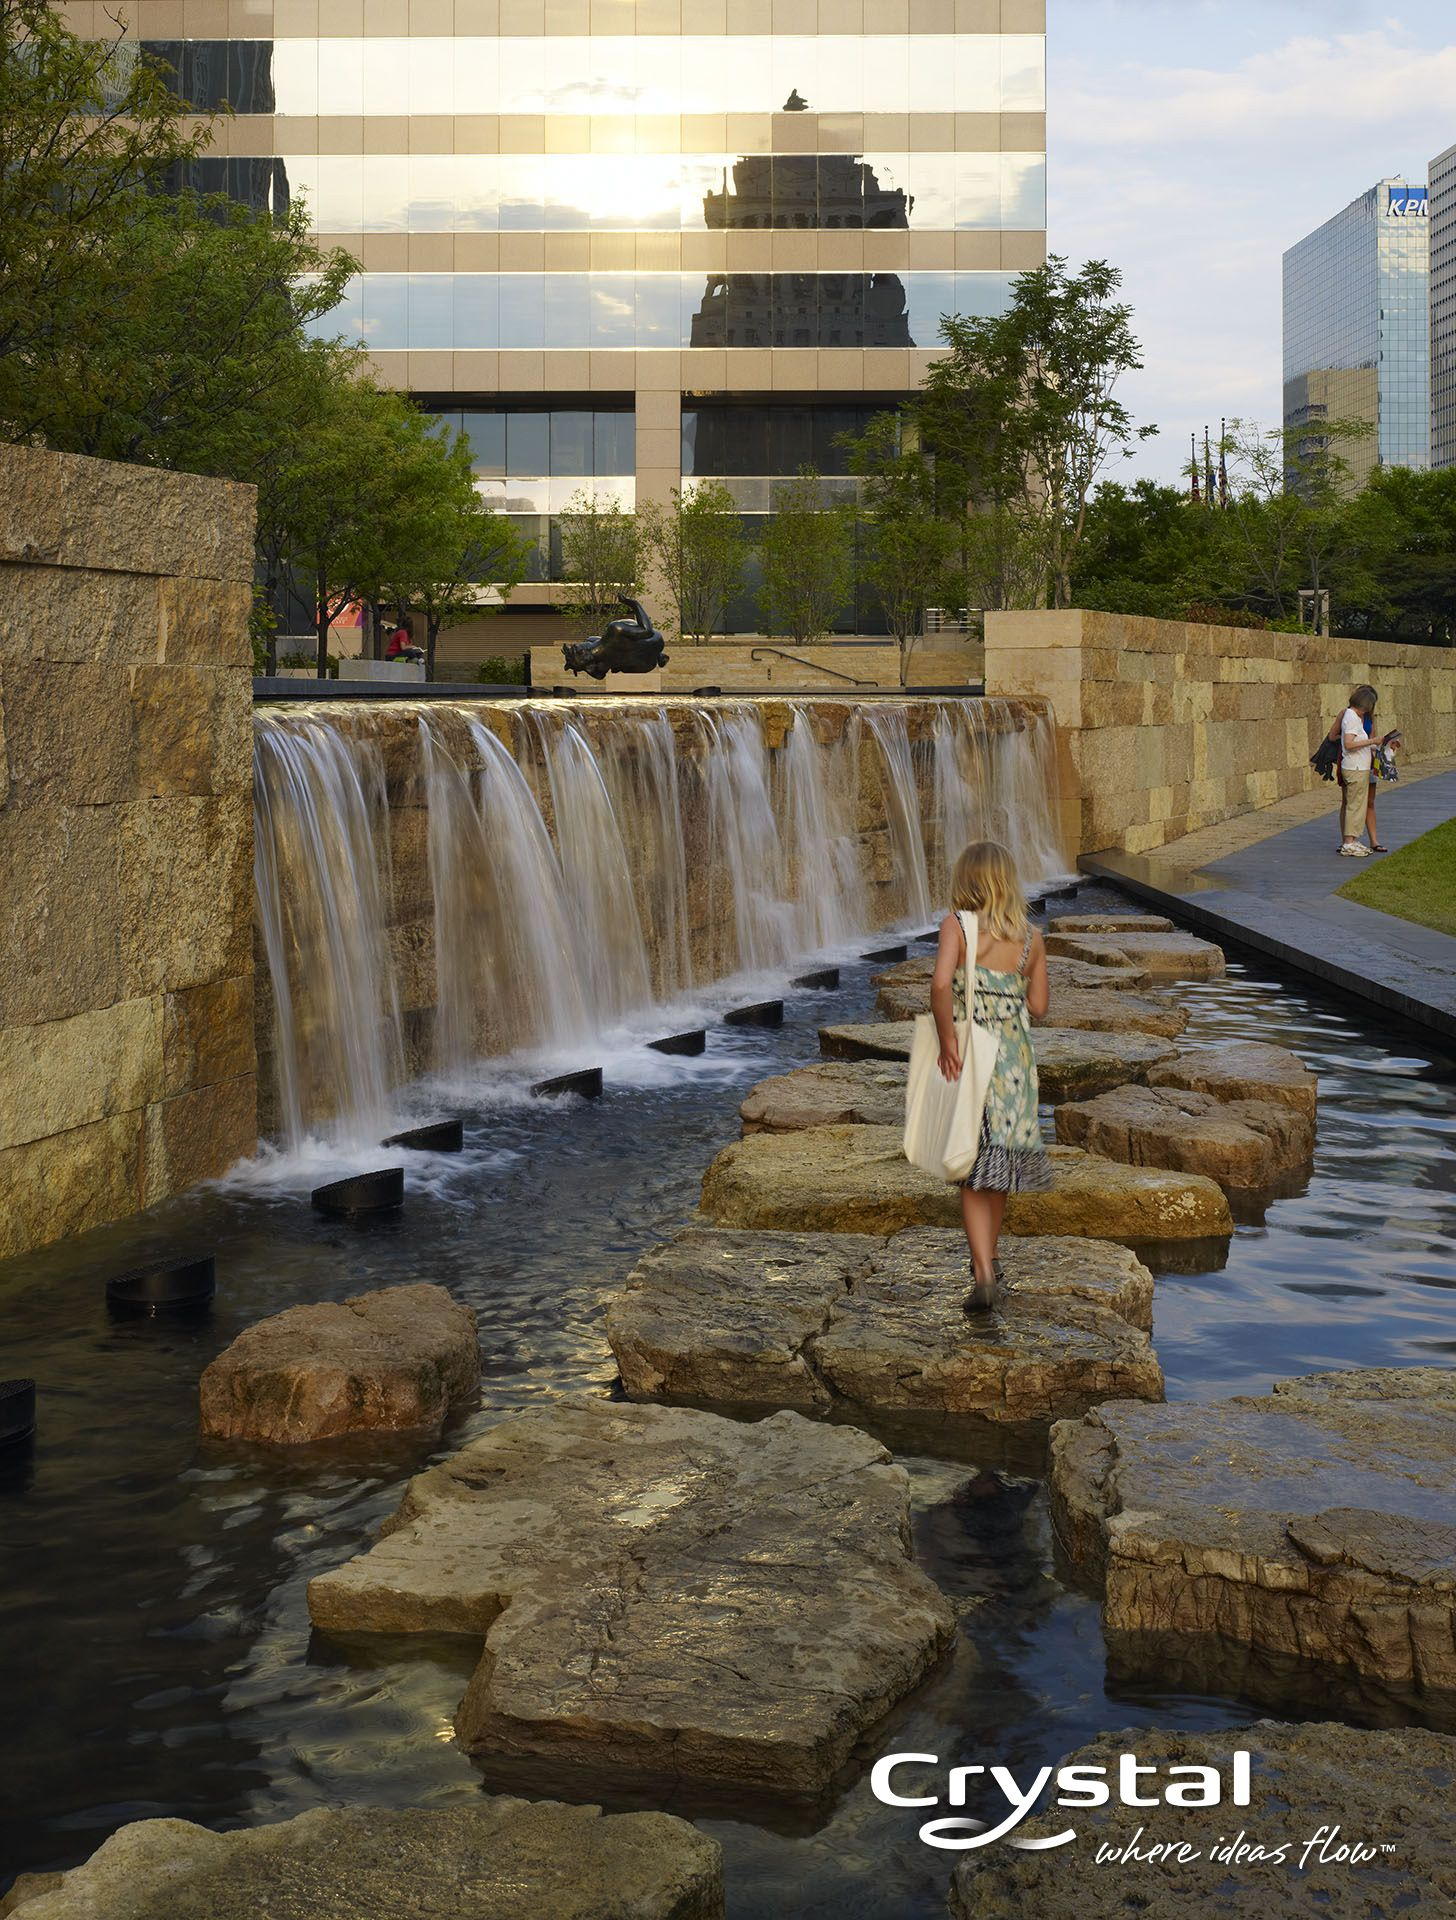 Citygarden - St. Louis, MO  Photo by Hydro Dramatics